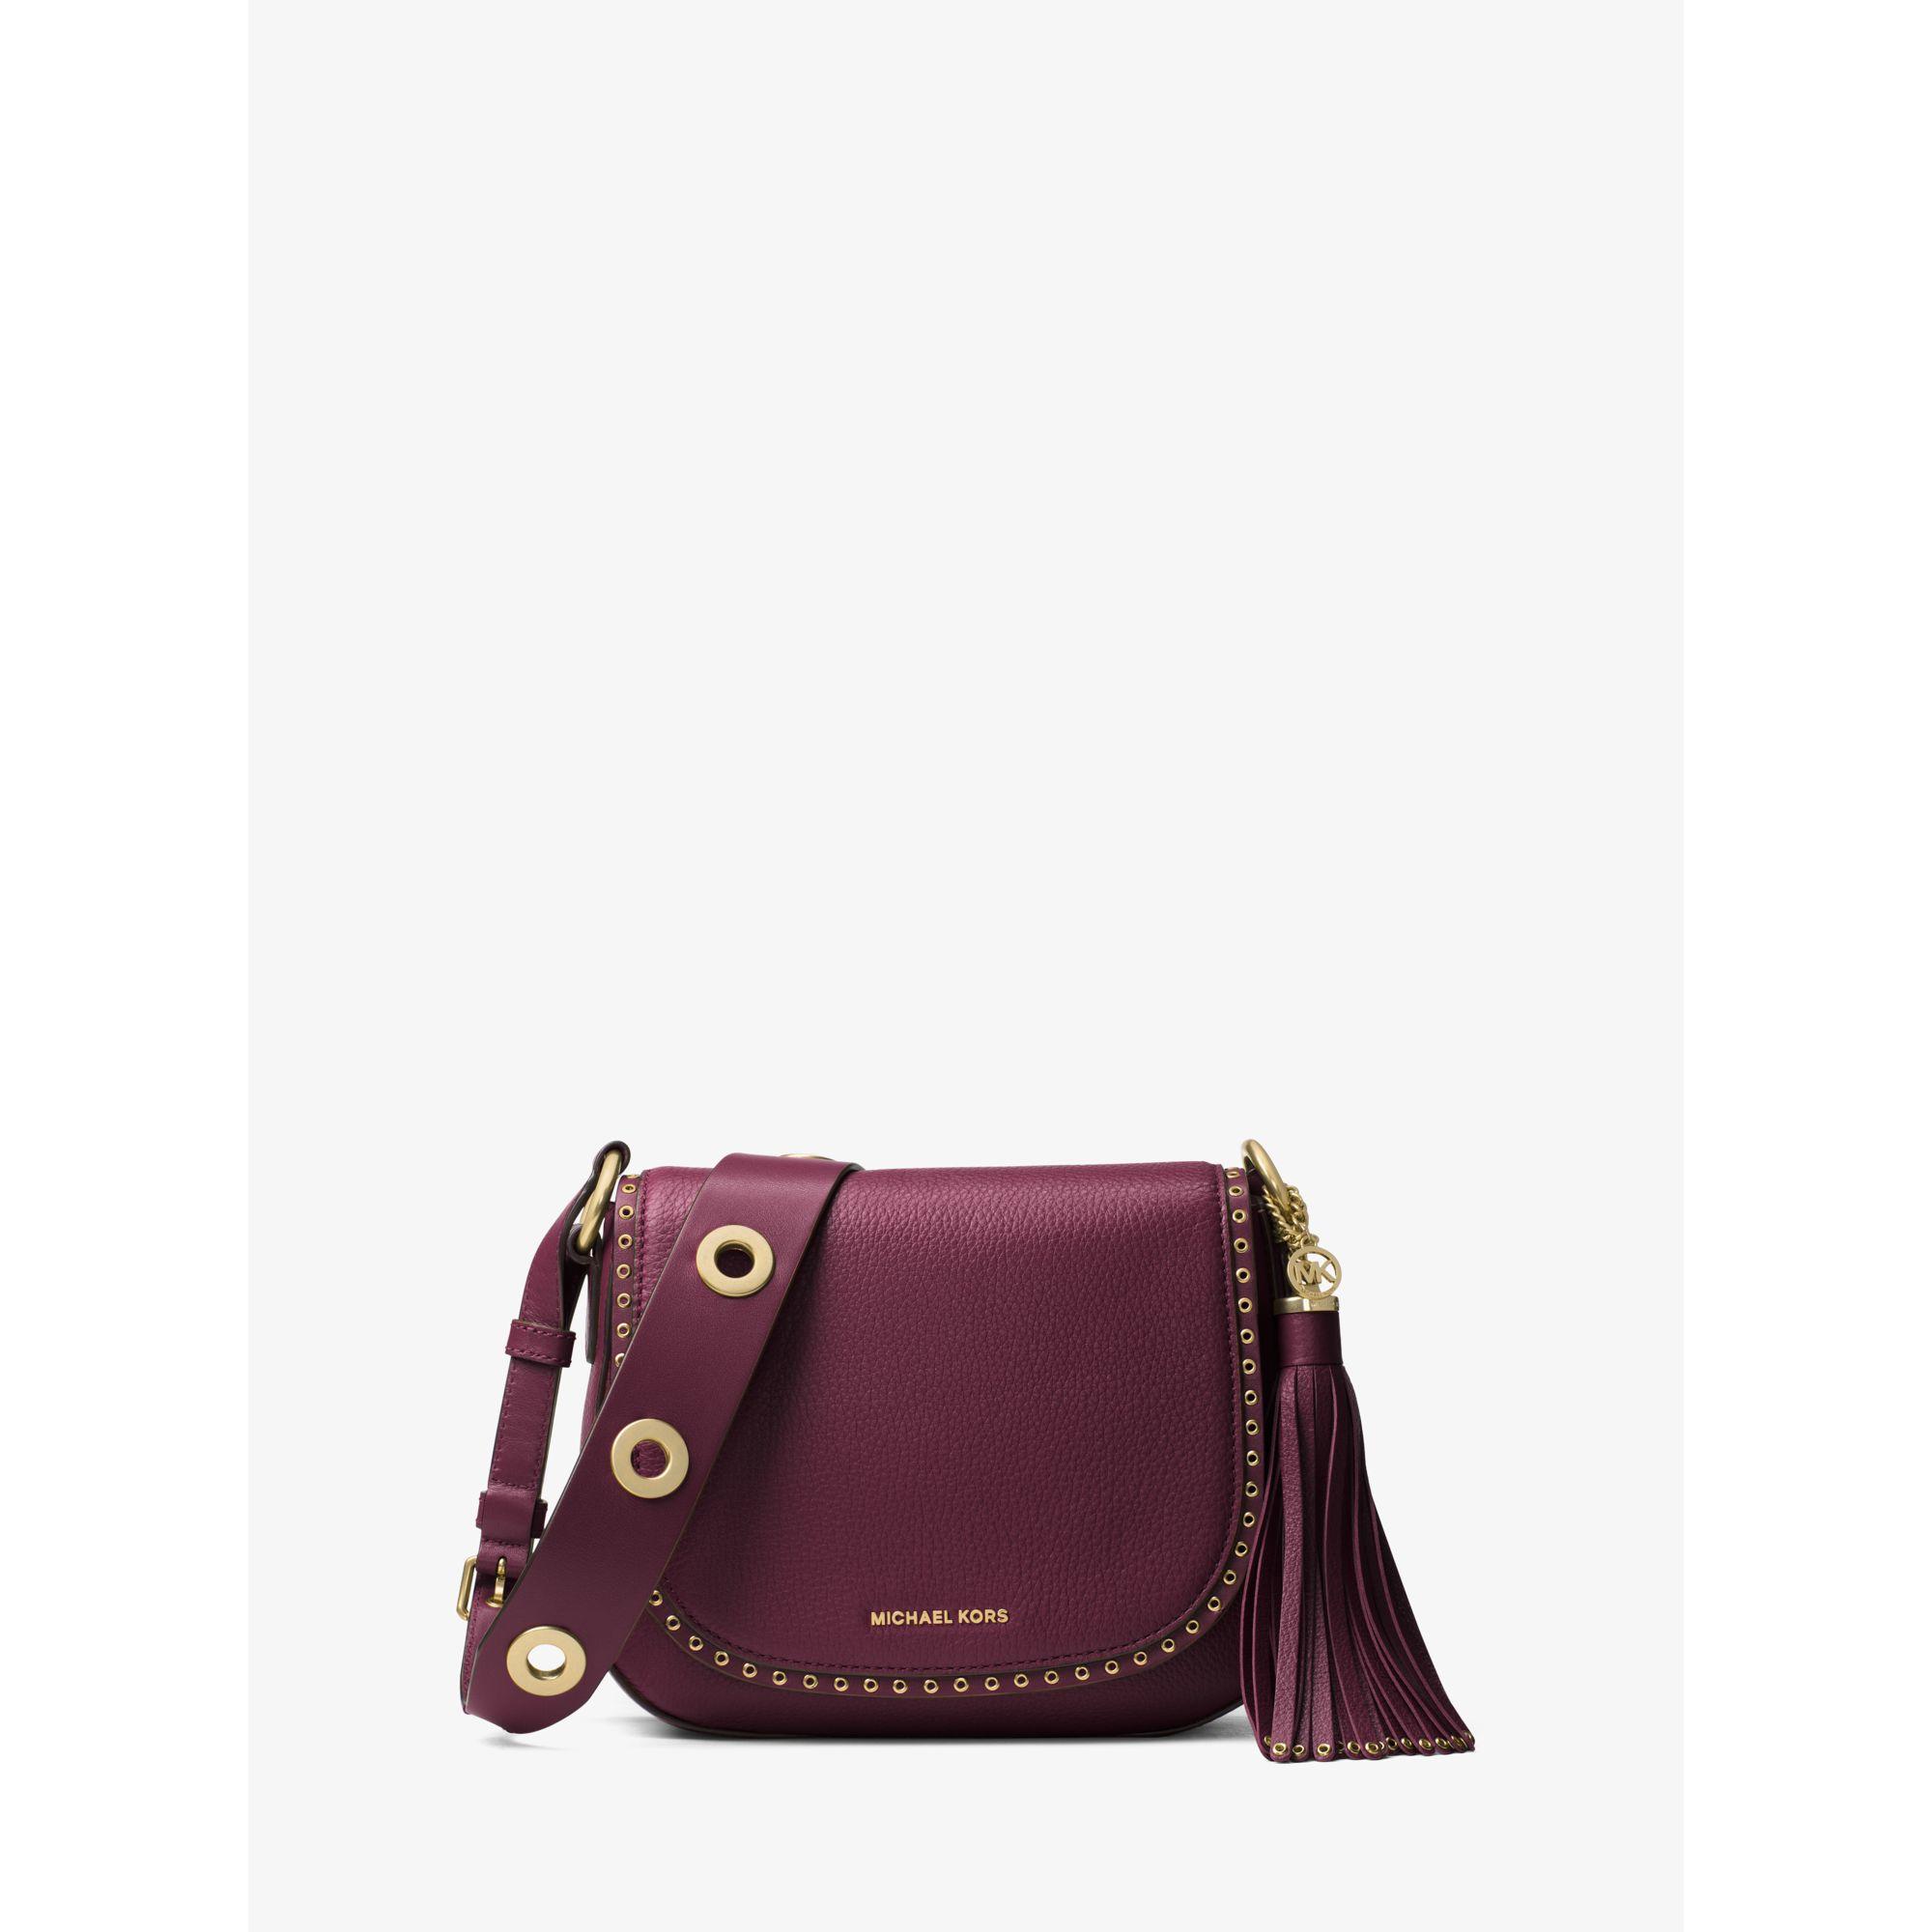 168052d68821 Michael Kors Brooklyn Medium Leather Saddlebag - Lyst